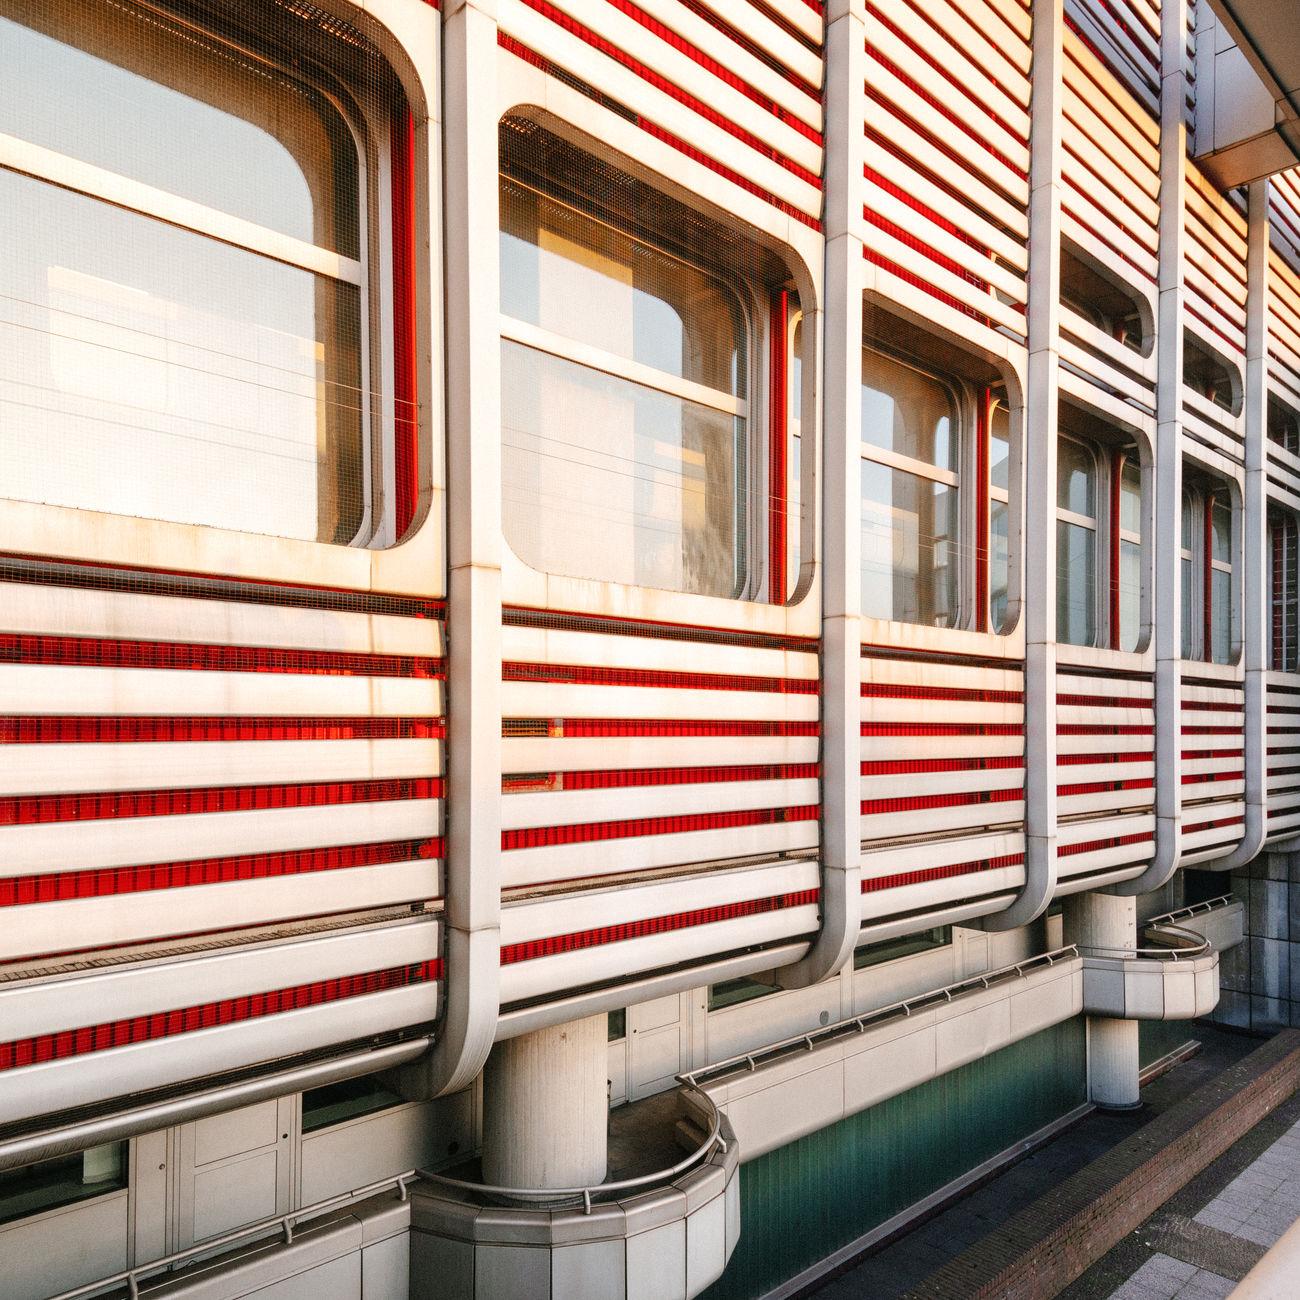 train, public transportation, window, train - vehicle, rail transportation